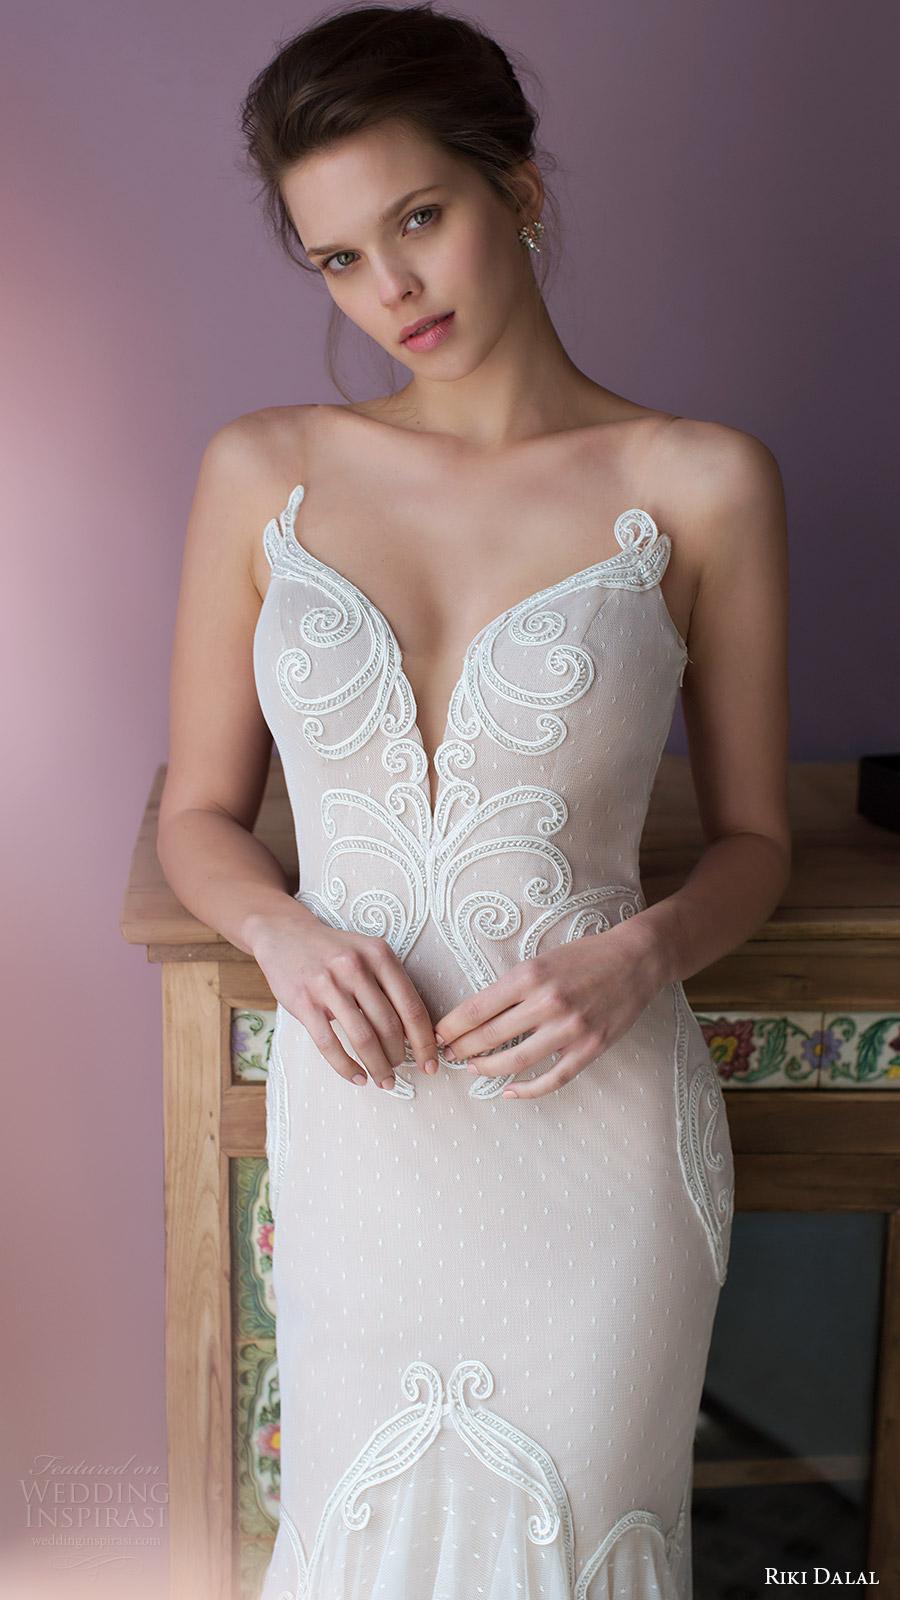 riki dalal bridal 2016 sleeveless deep sweetheart illusion straps mermaid fit flare wedding dress (1807) off white zv elegant